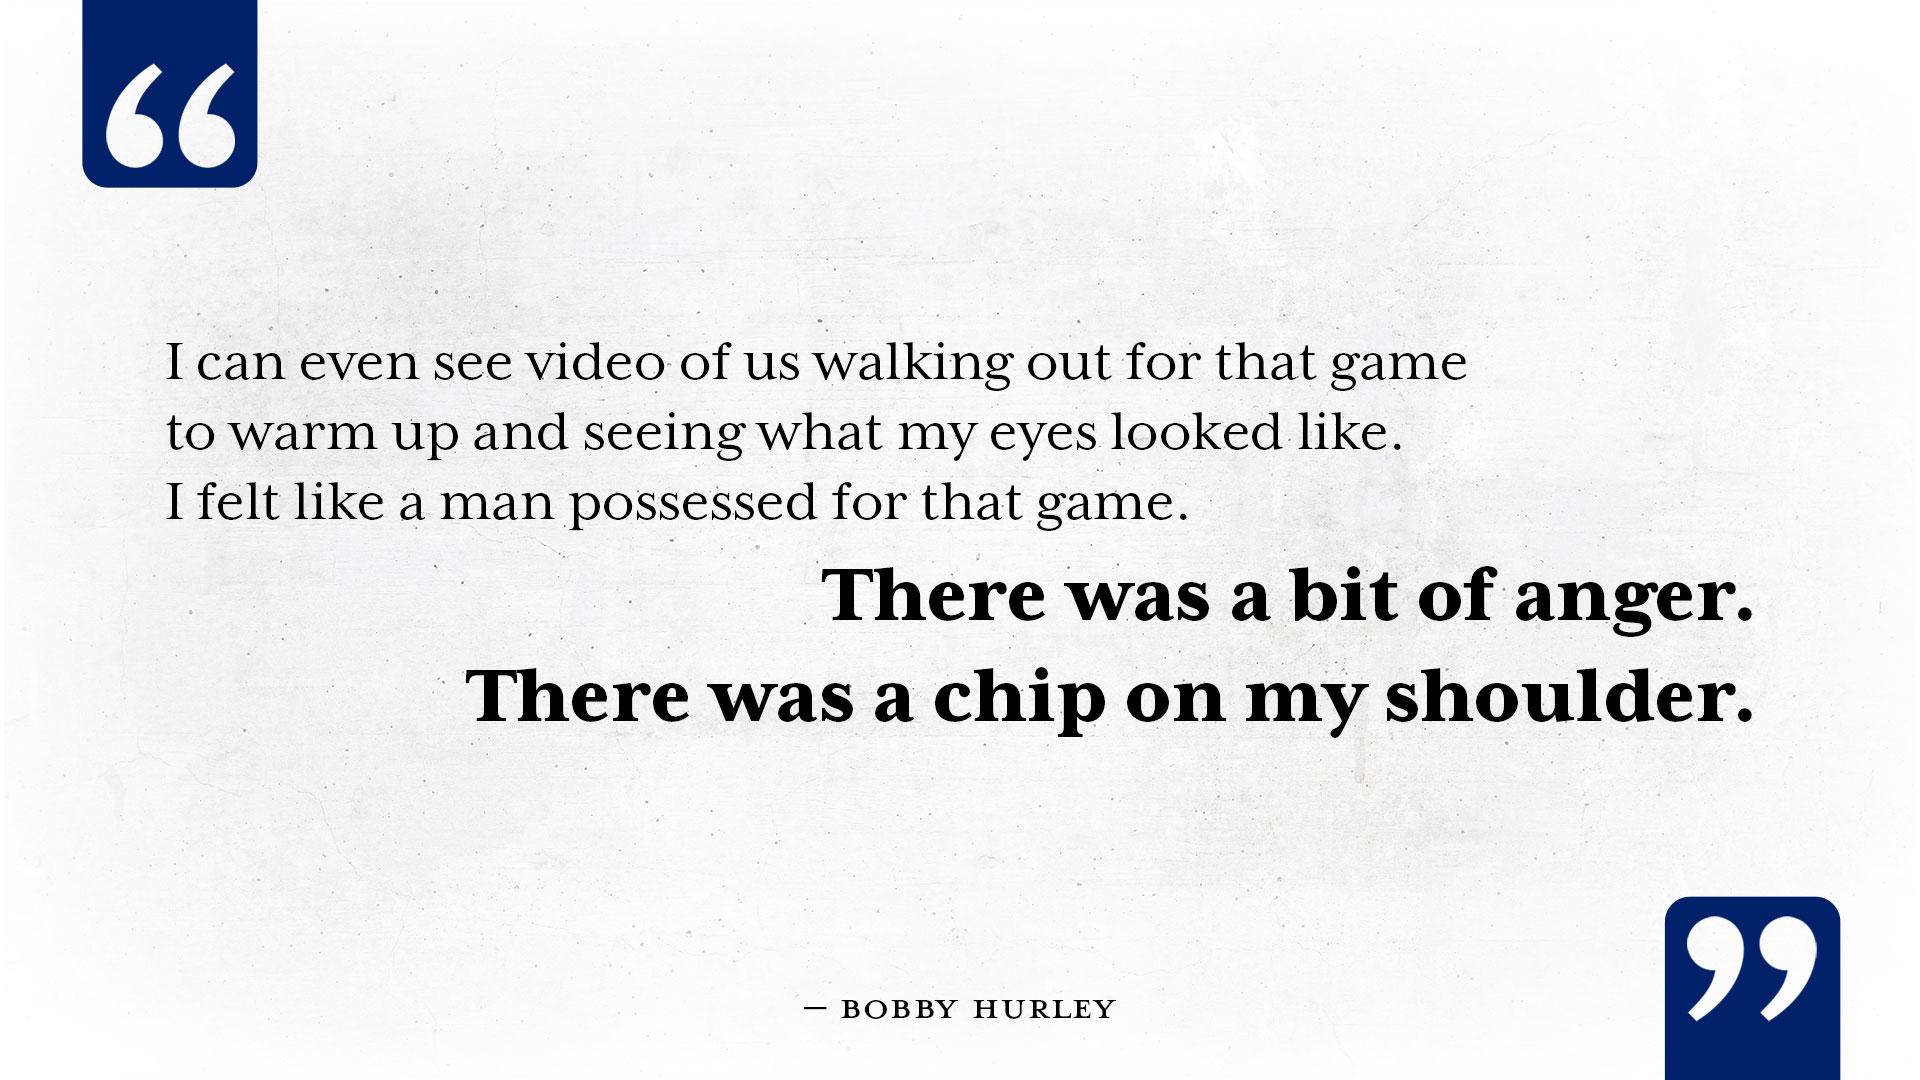 bobby hurley quotes16x9 quote2jpg cz67csrnbigj1k2gcr8wsc6nz